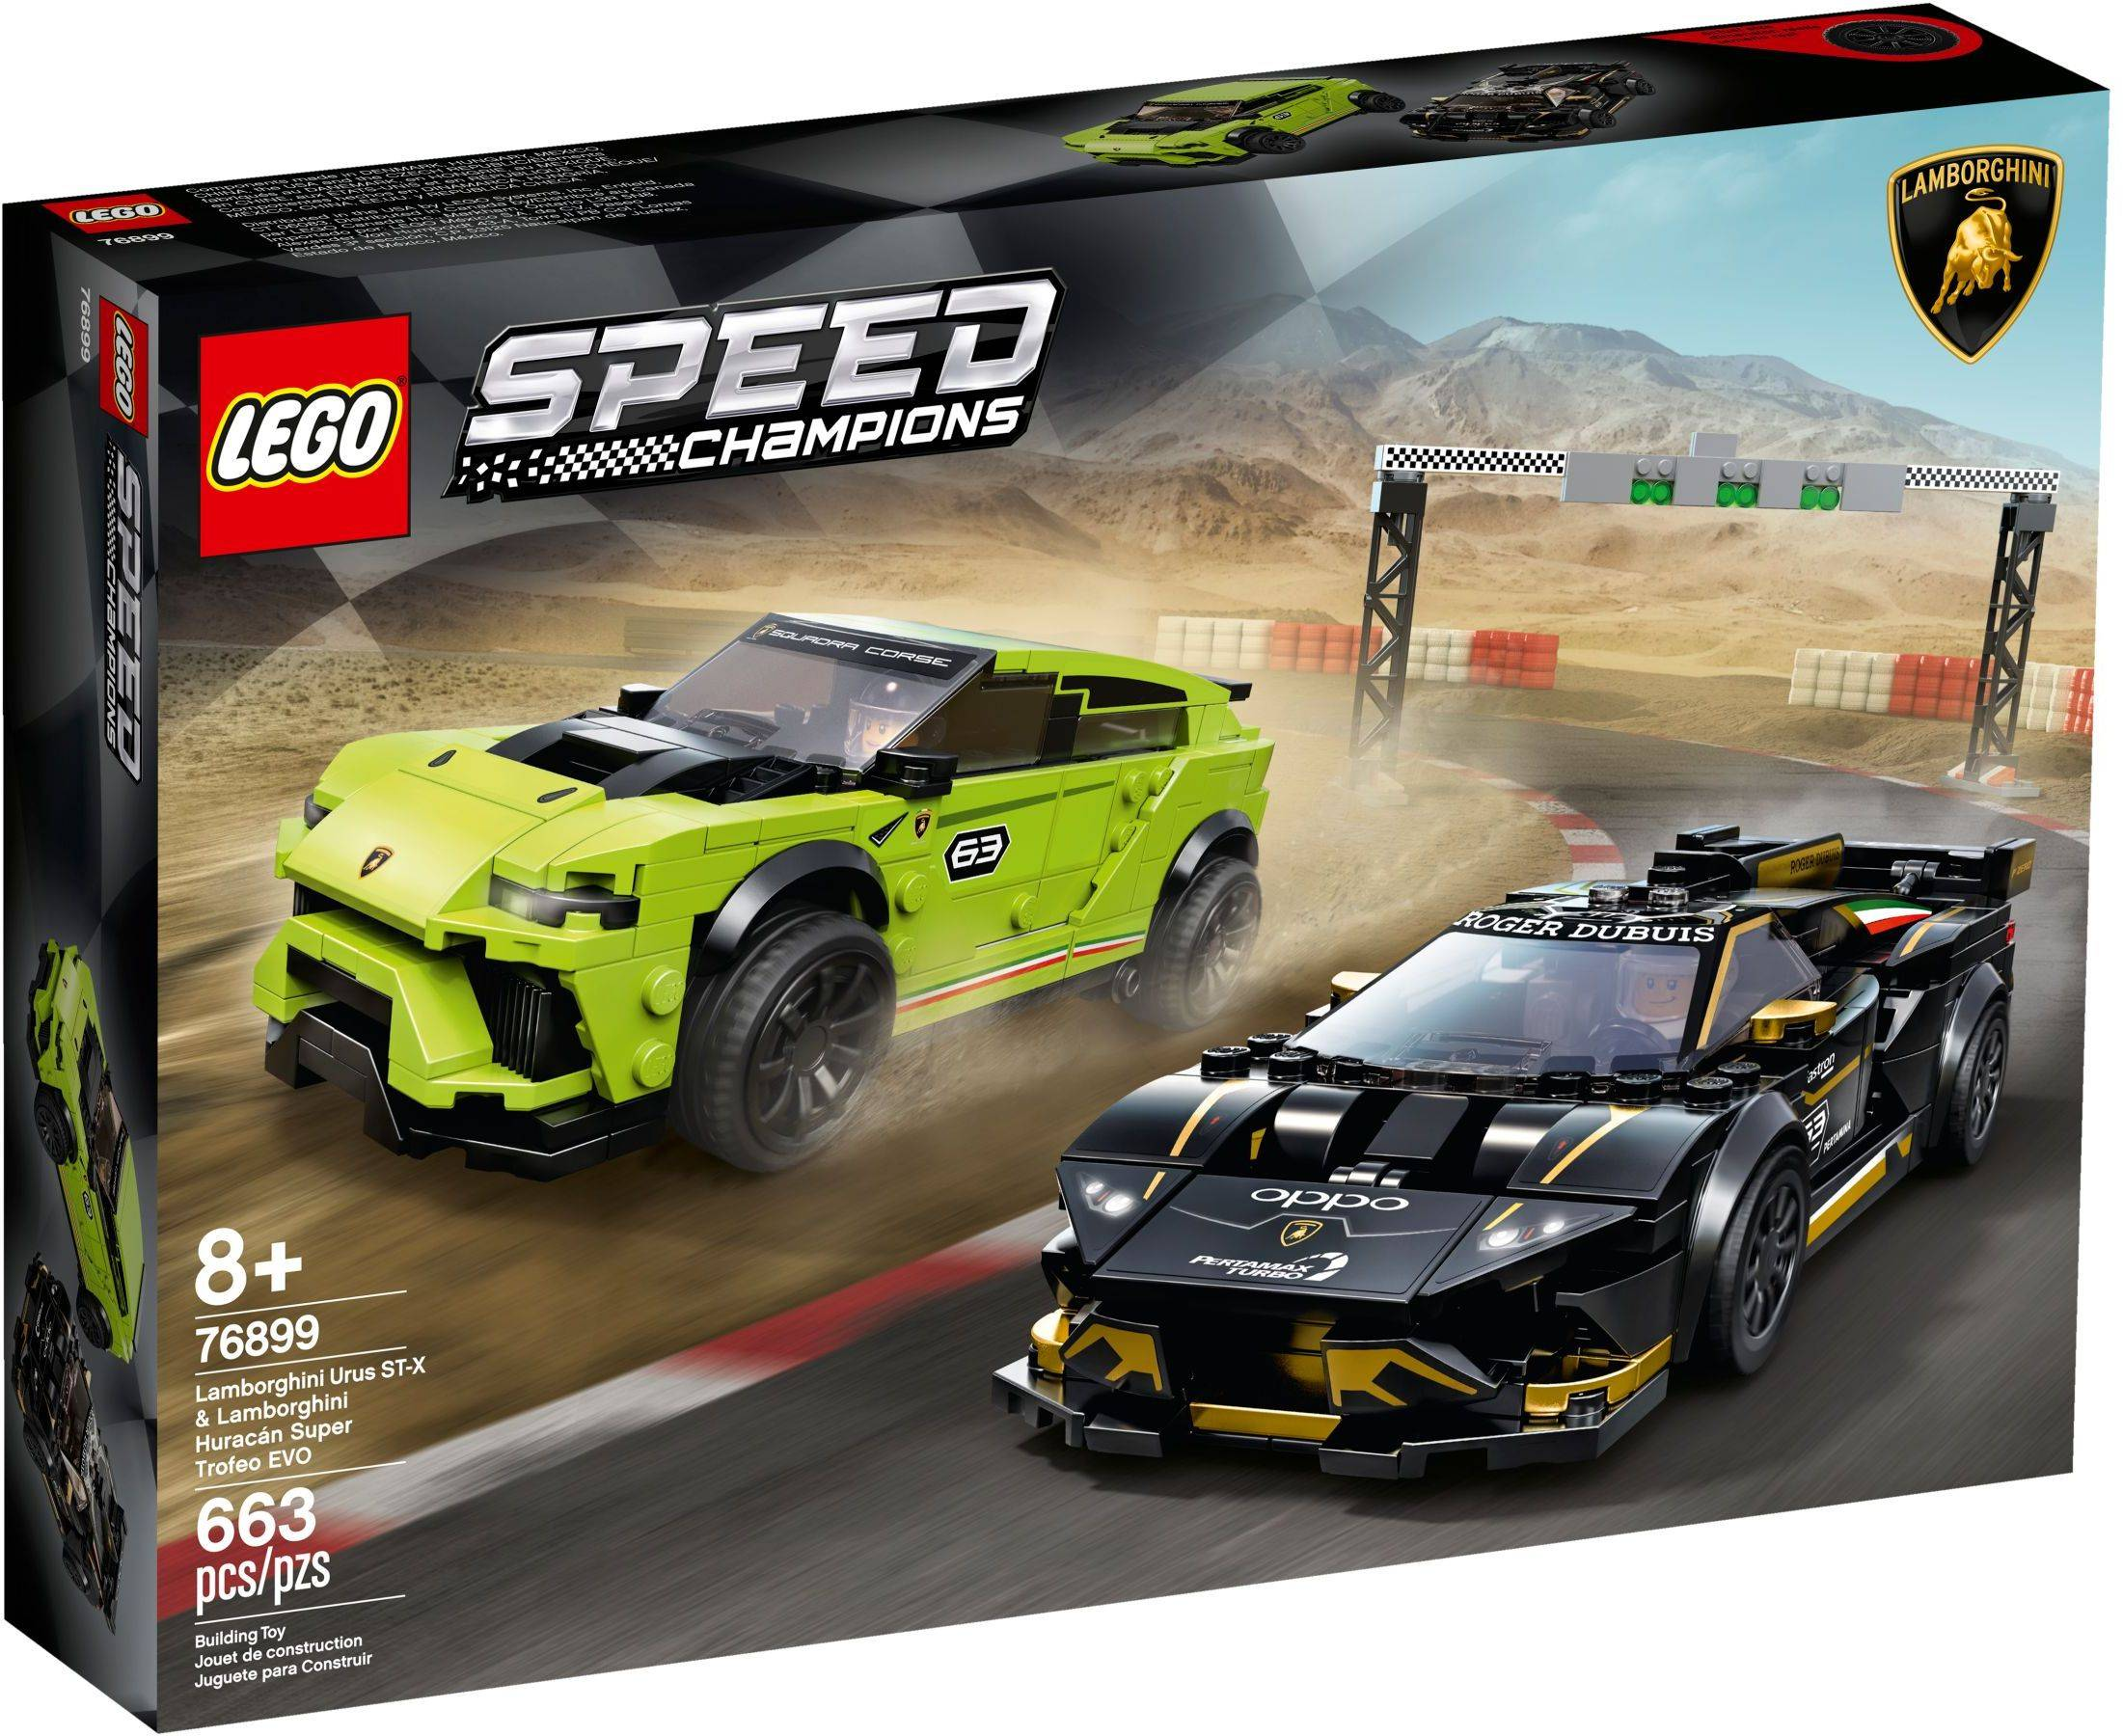 LEGO 76899: Lamborghini Huracán Super Trofeo EVO & Urus ST-X